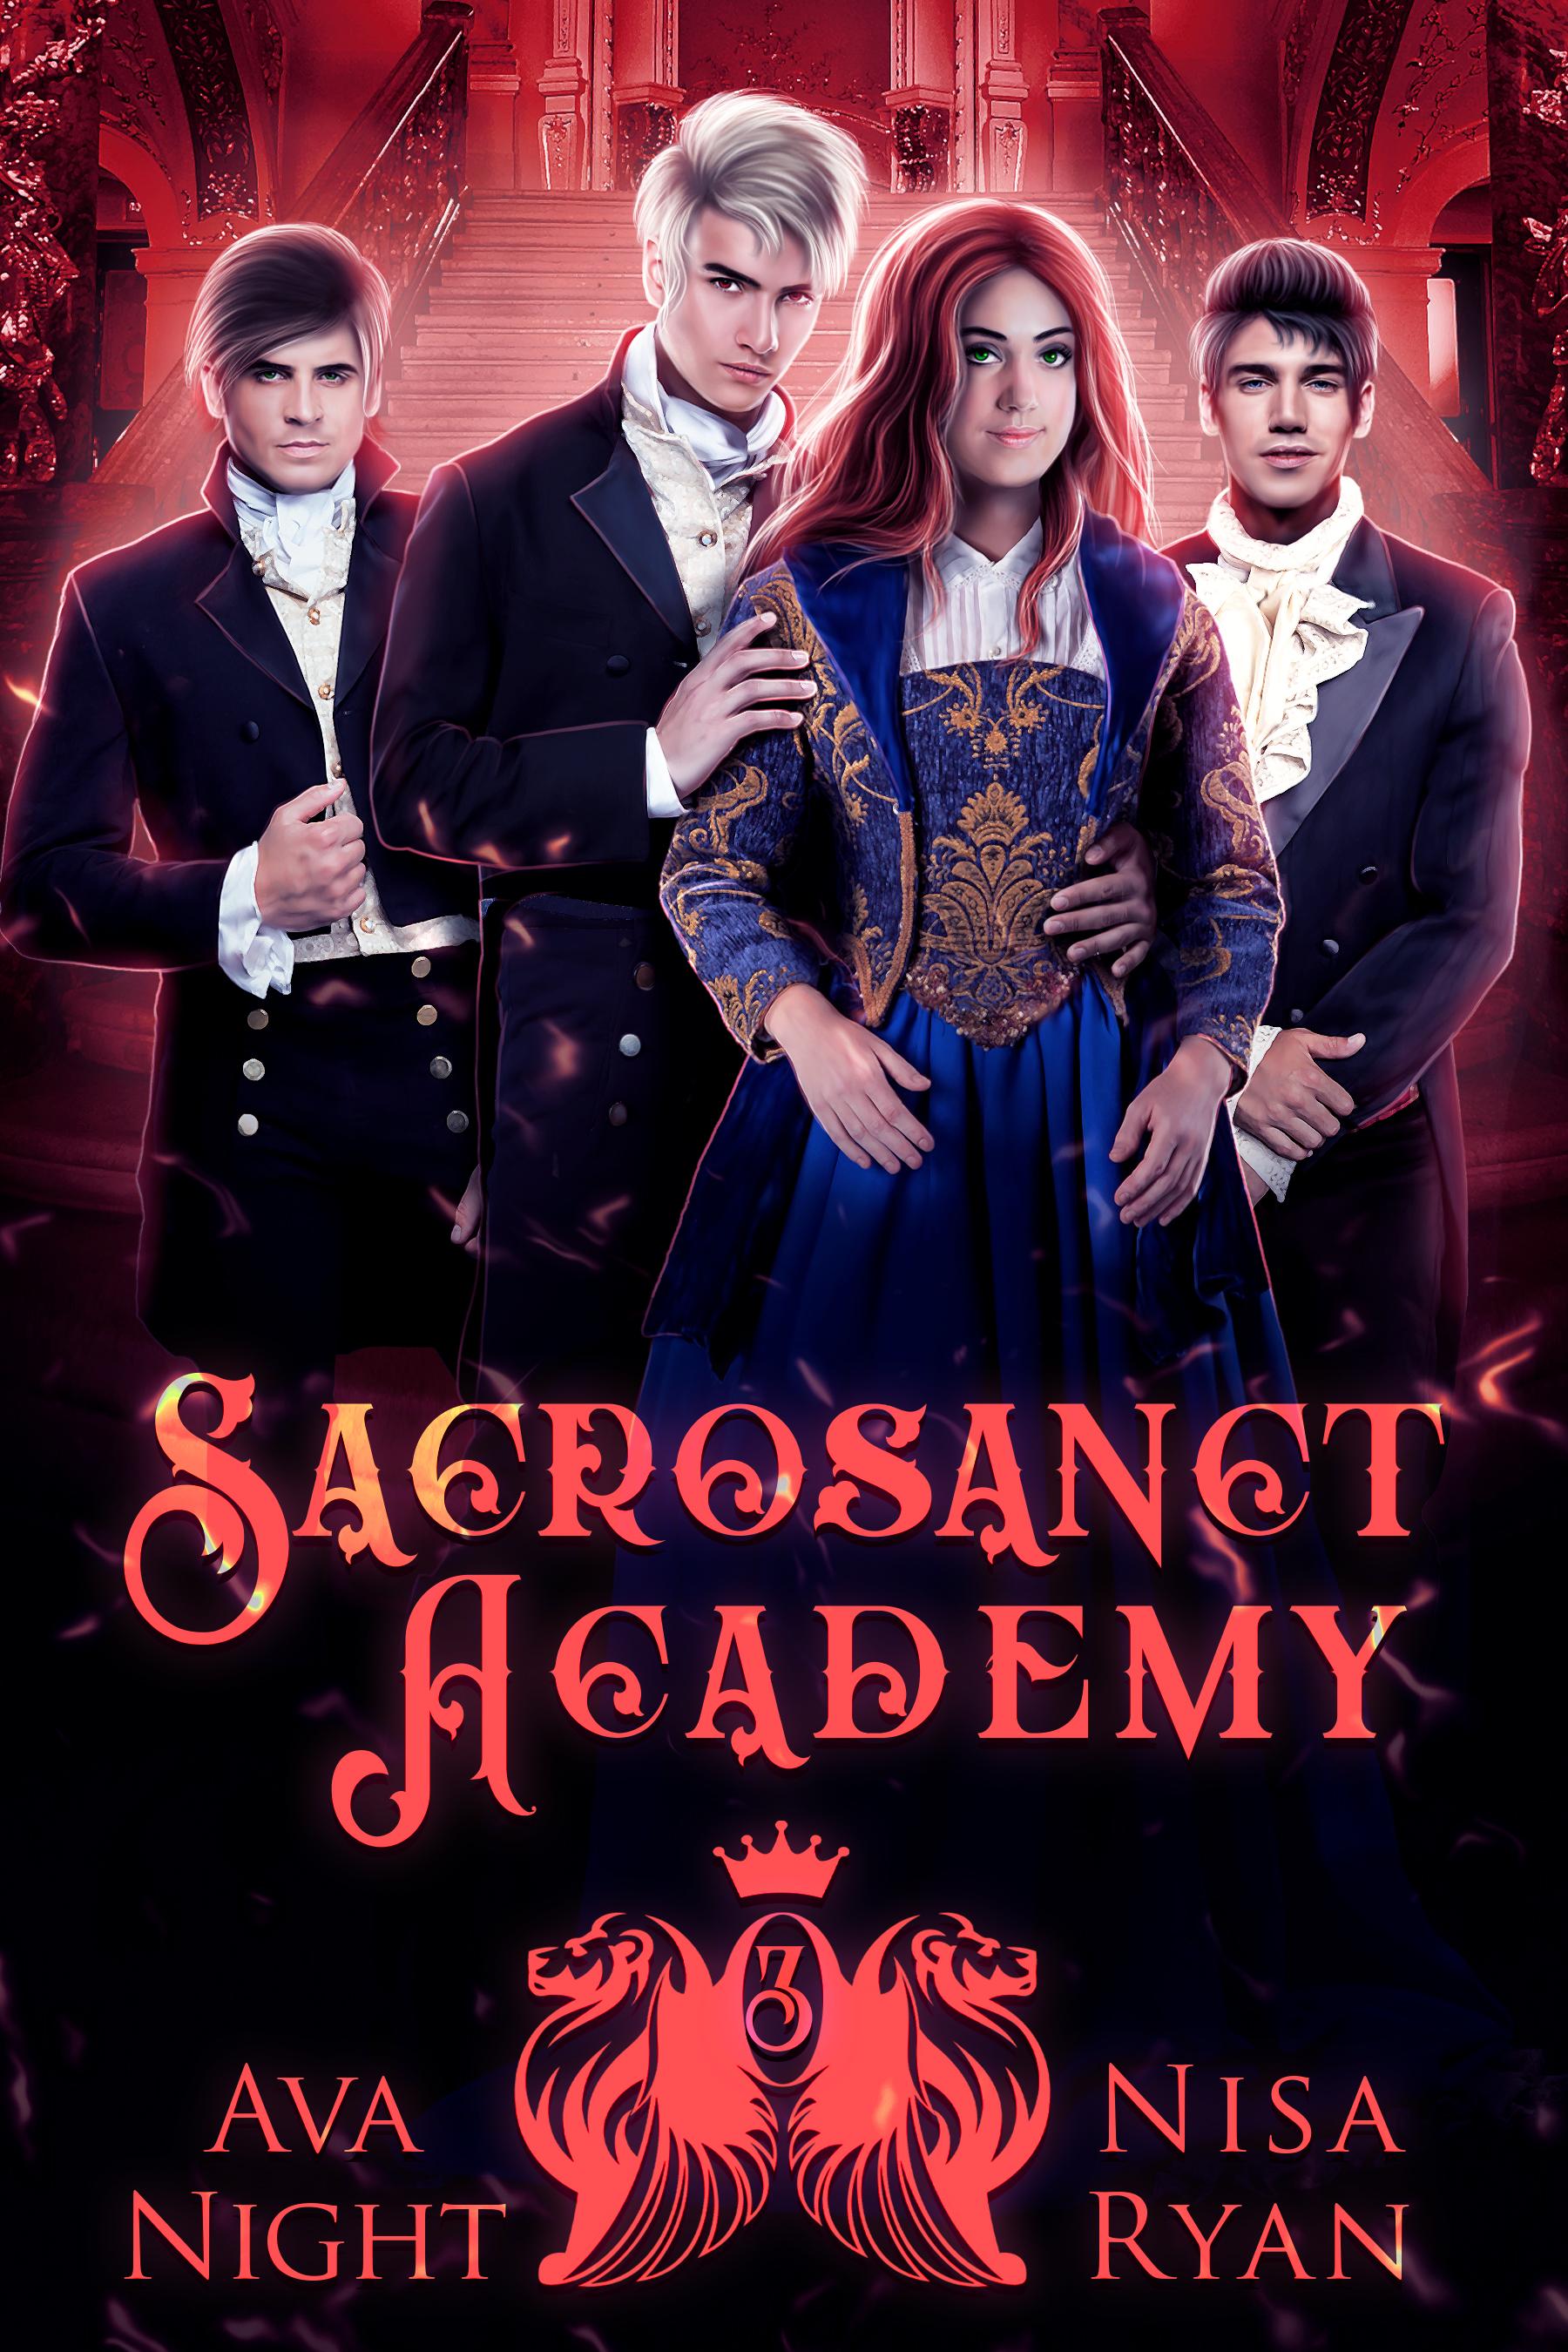 Sacrosanct Academy3